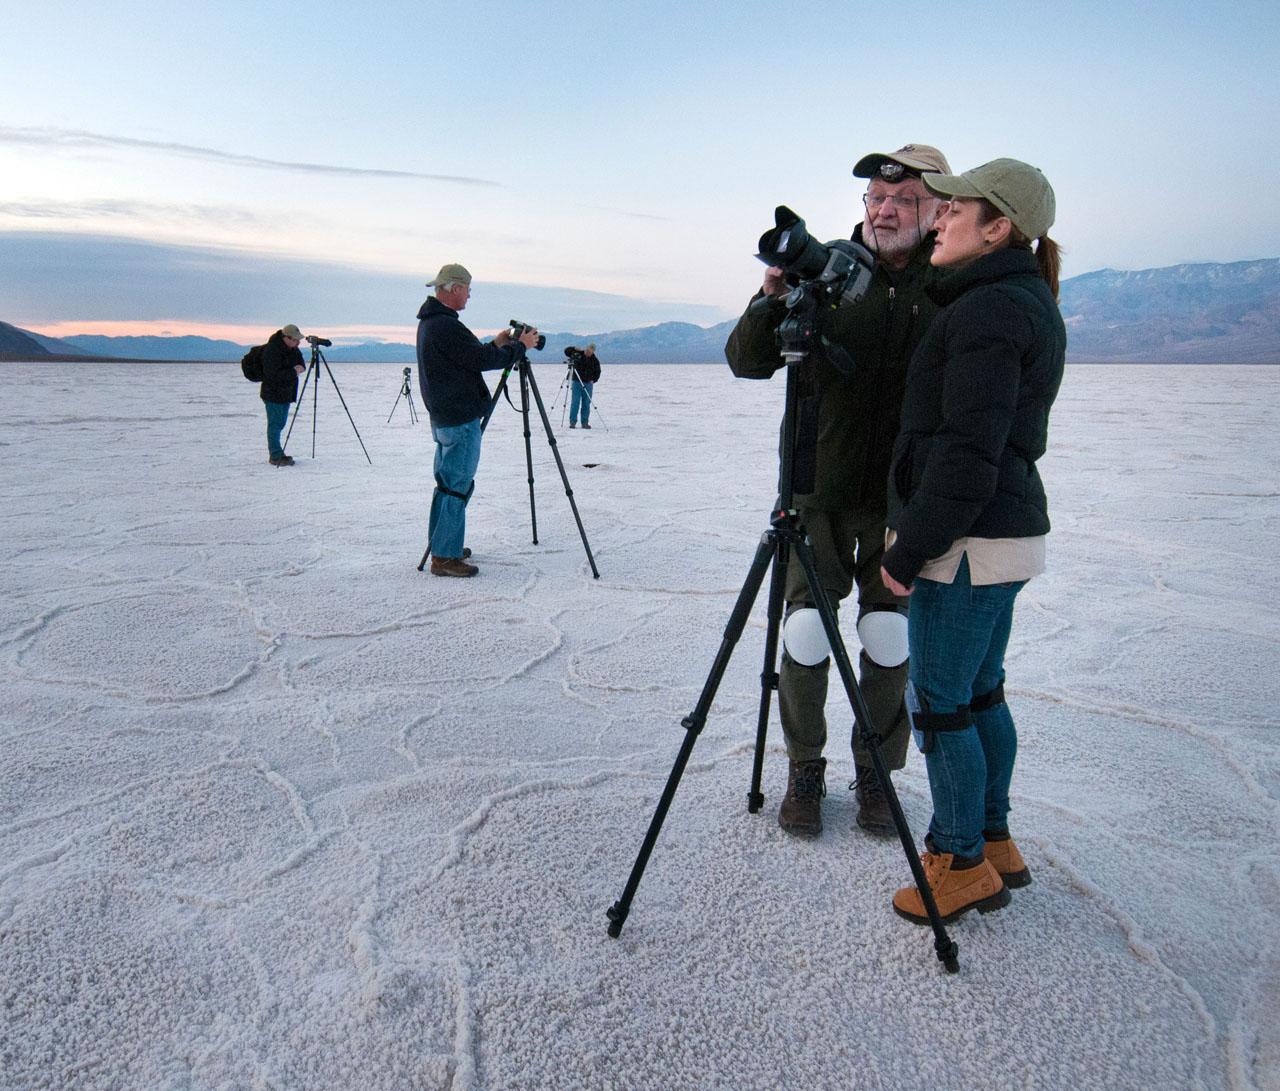 Death_Valley_2012_web_009.jpg